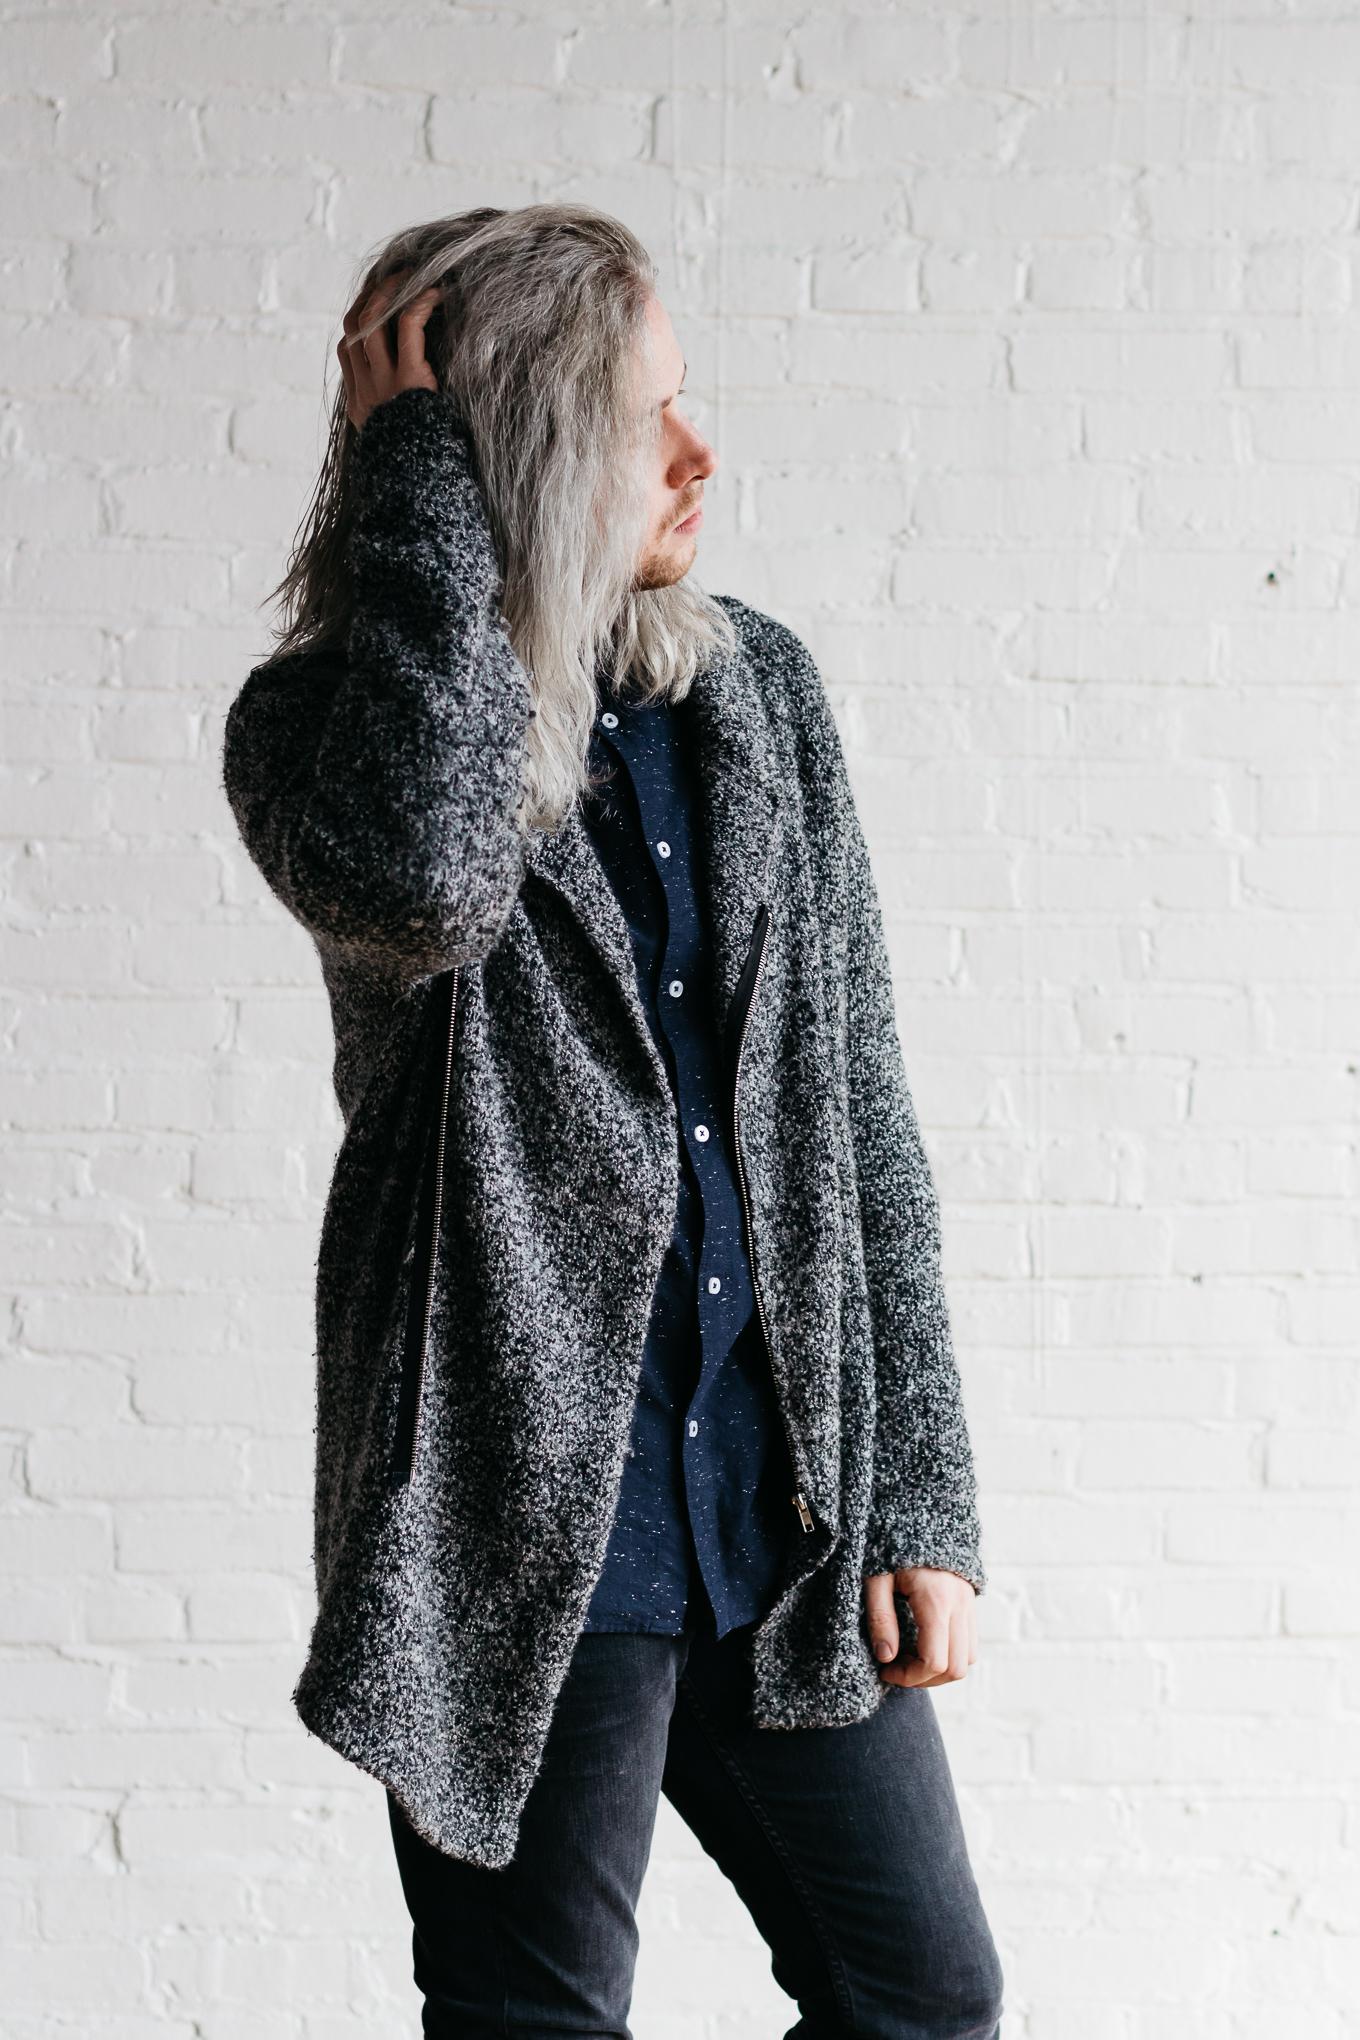 silver fox, nyfw, nyfwm, what to wear to nyfwm